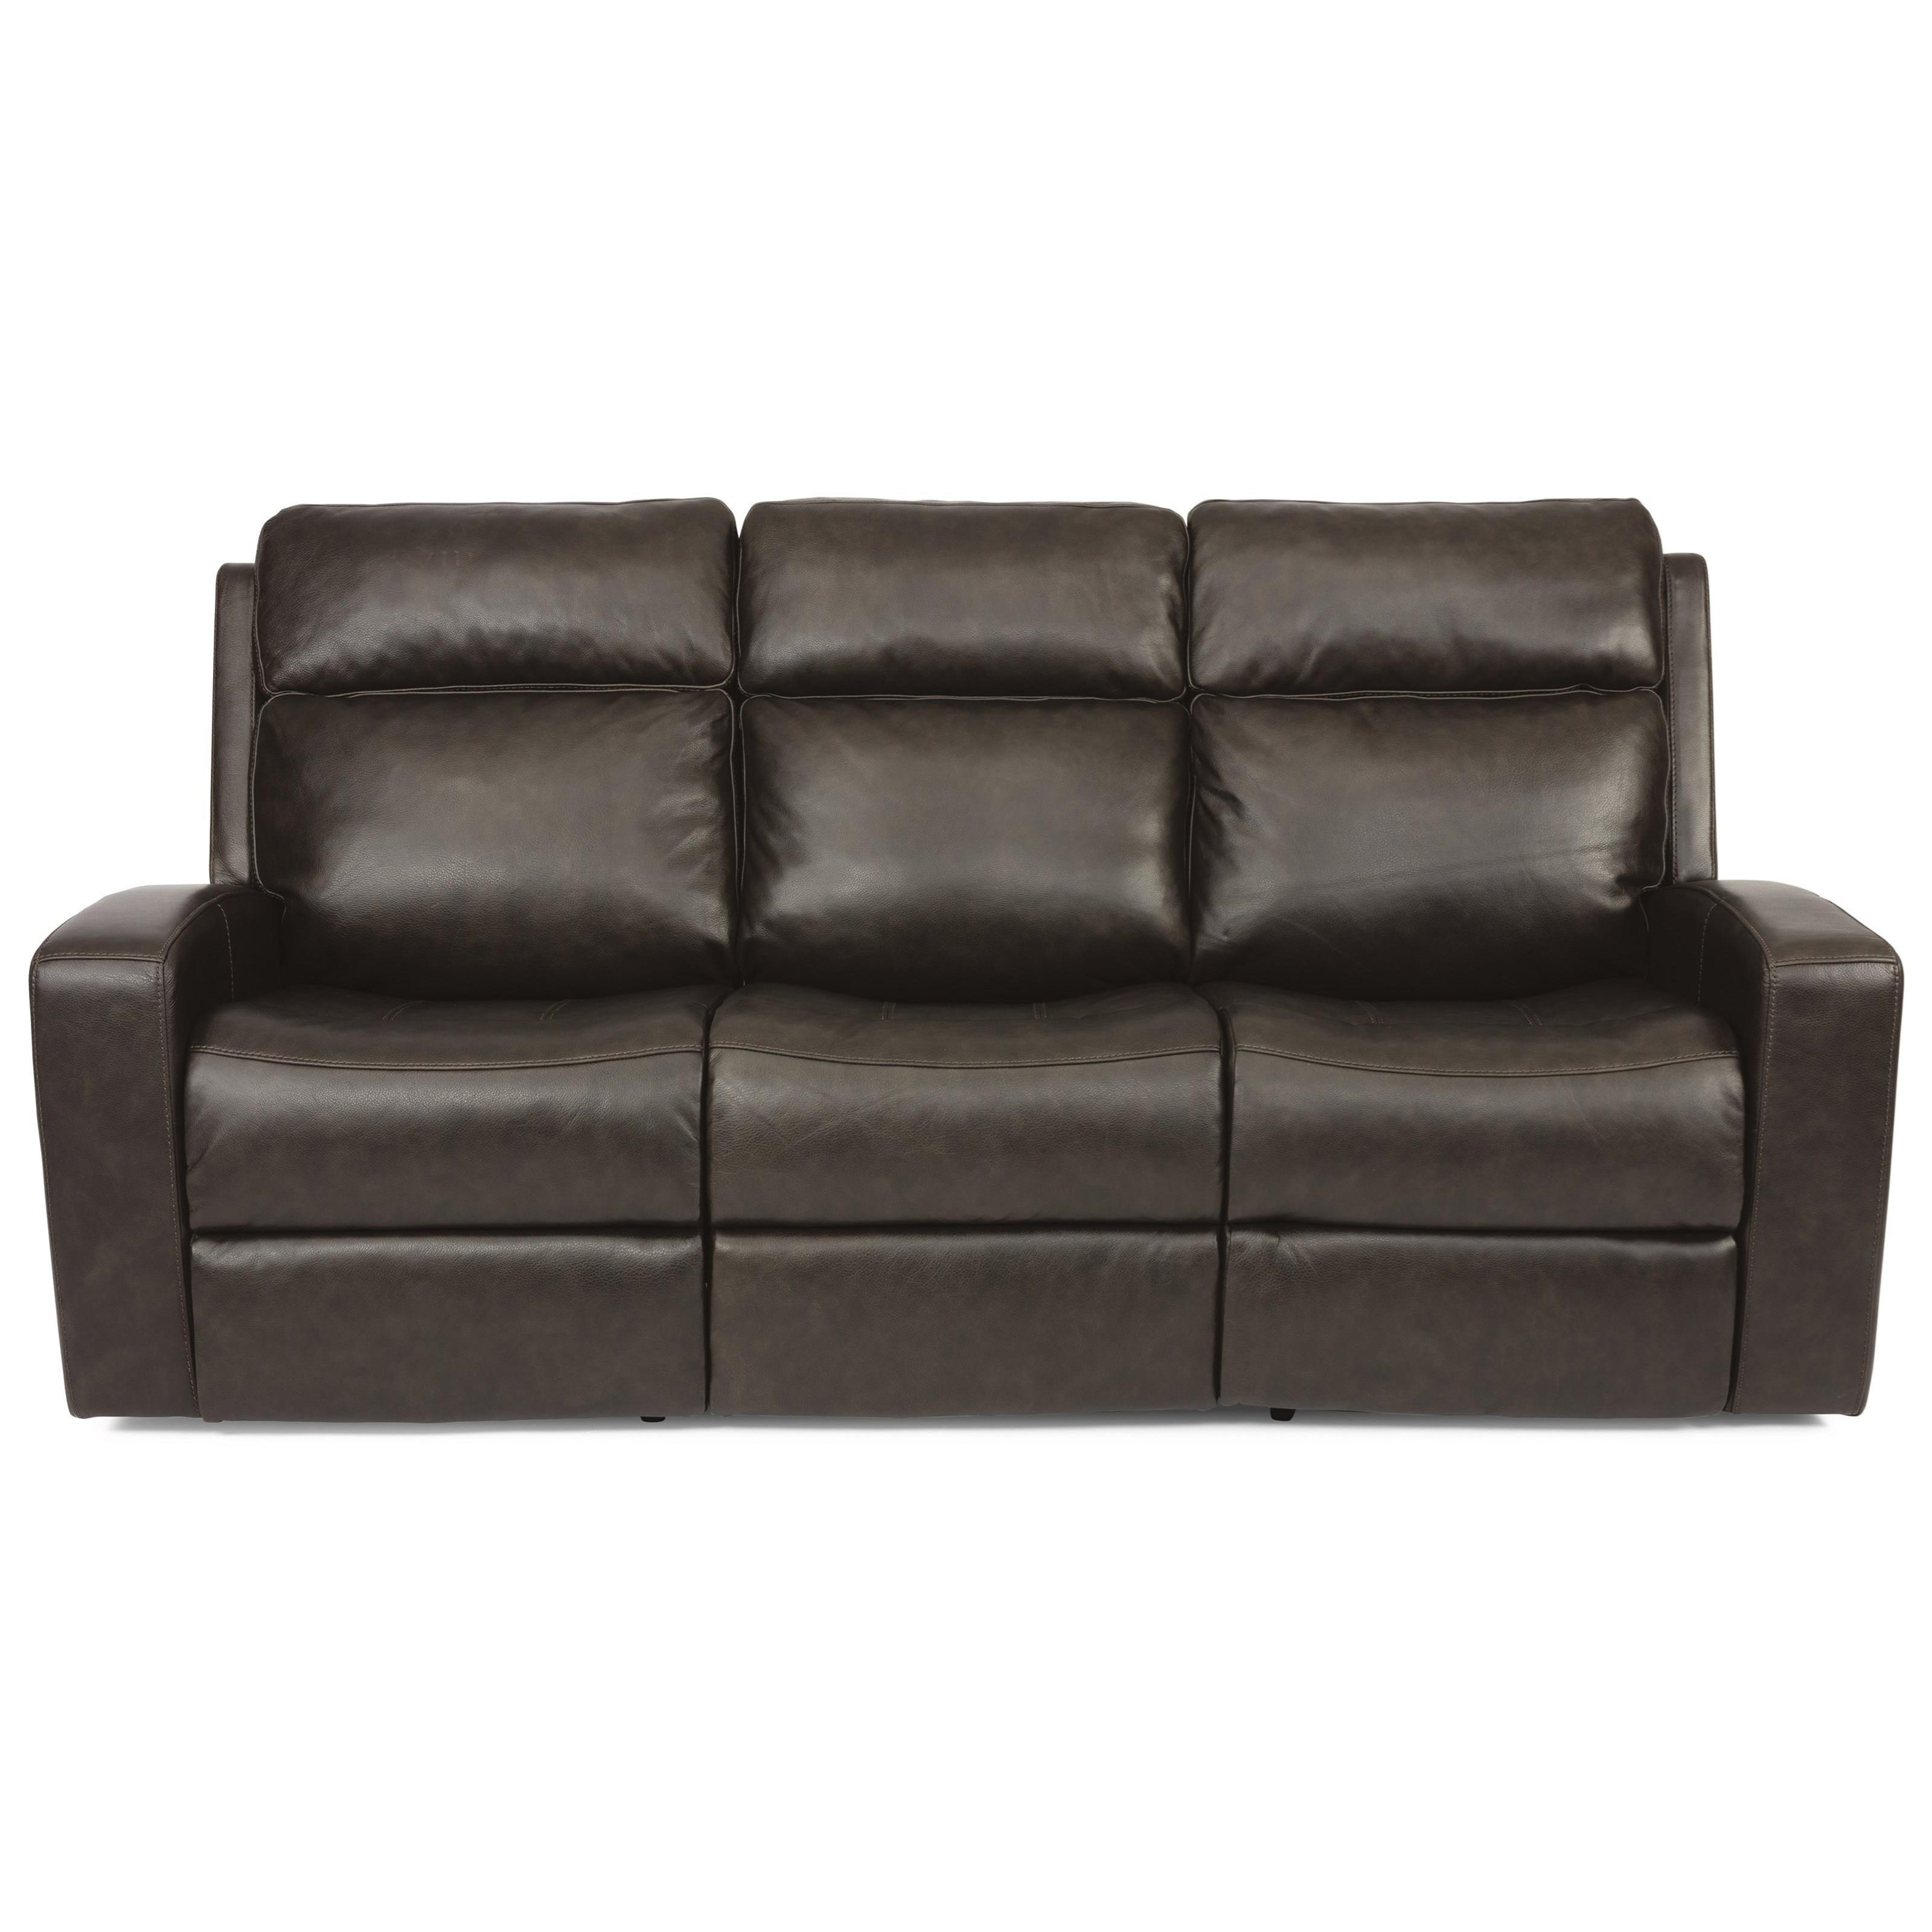 Latitudes - Cody Power Reclining Sofa by Flexsteel at Steger's Furniture